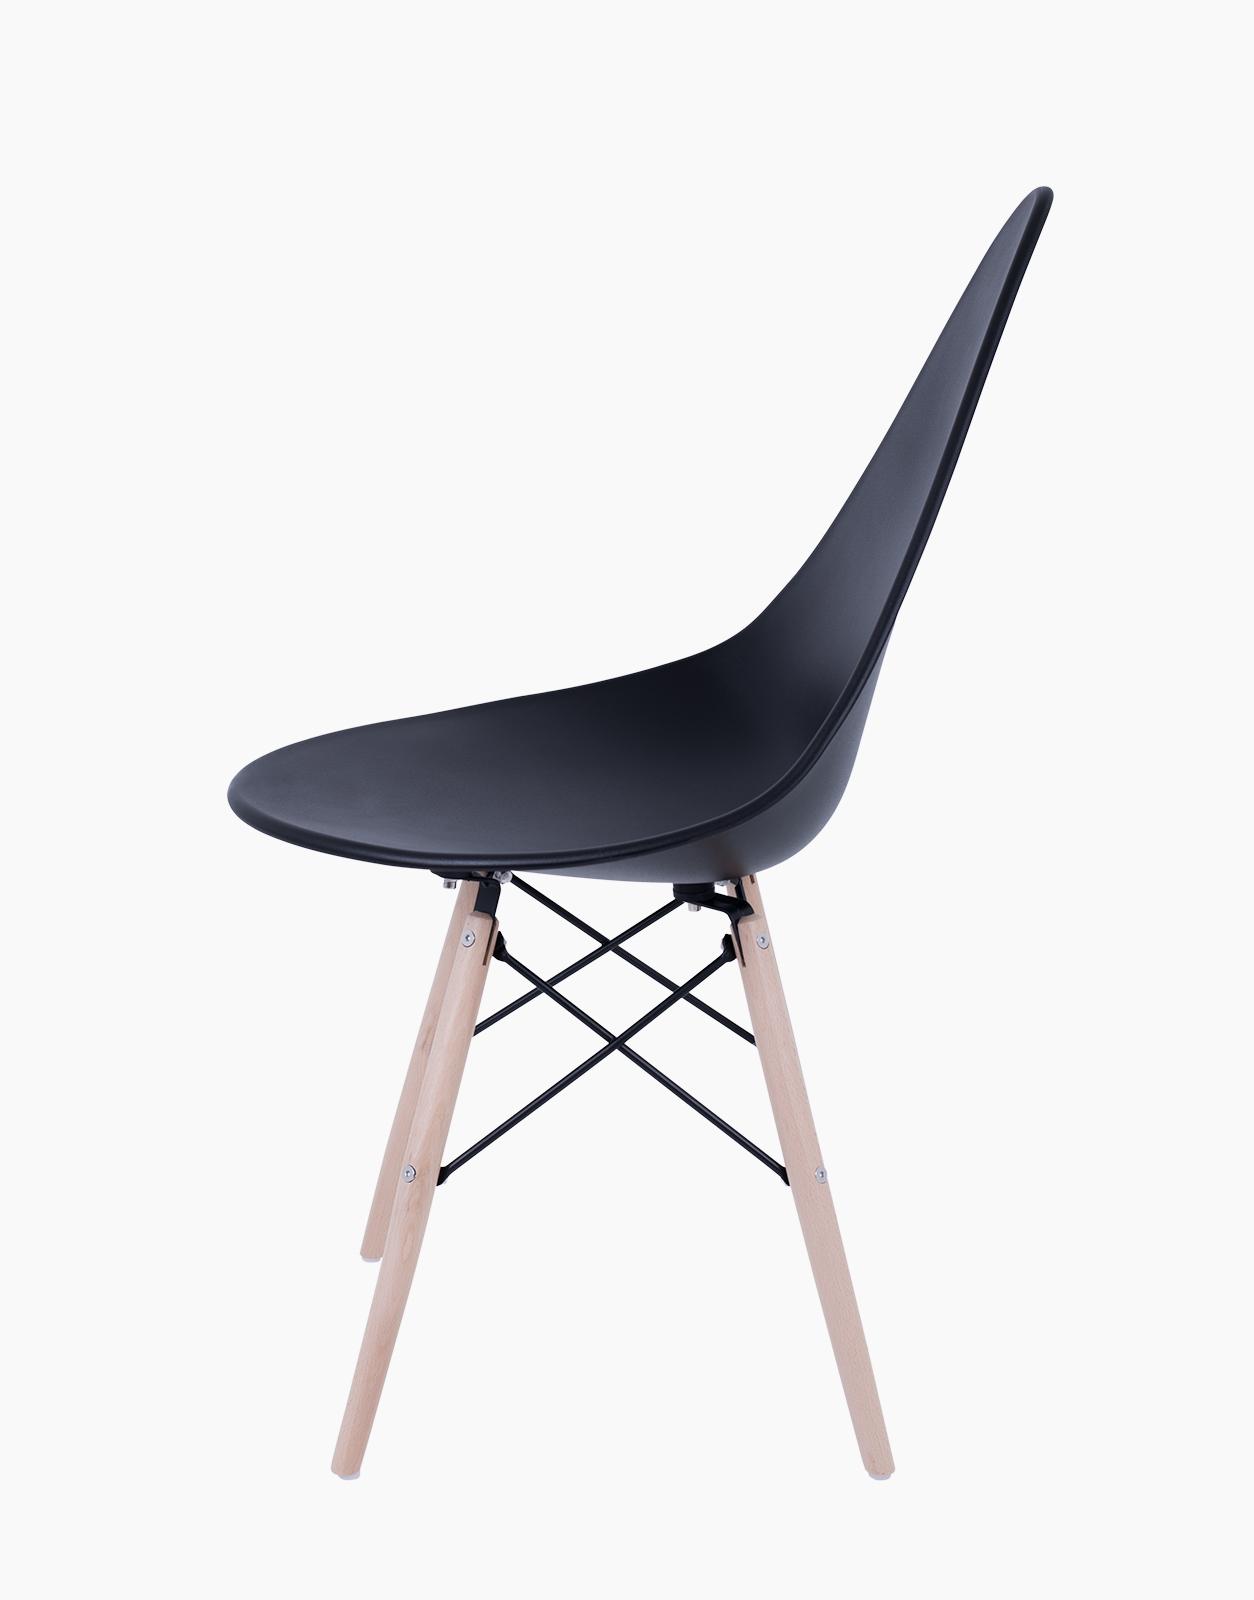 black gusto chairs set of 4 solution. Black Bedroom Furniture Sets. Home Design Ideas